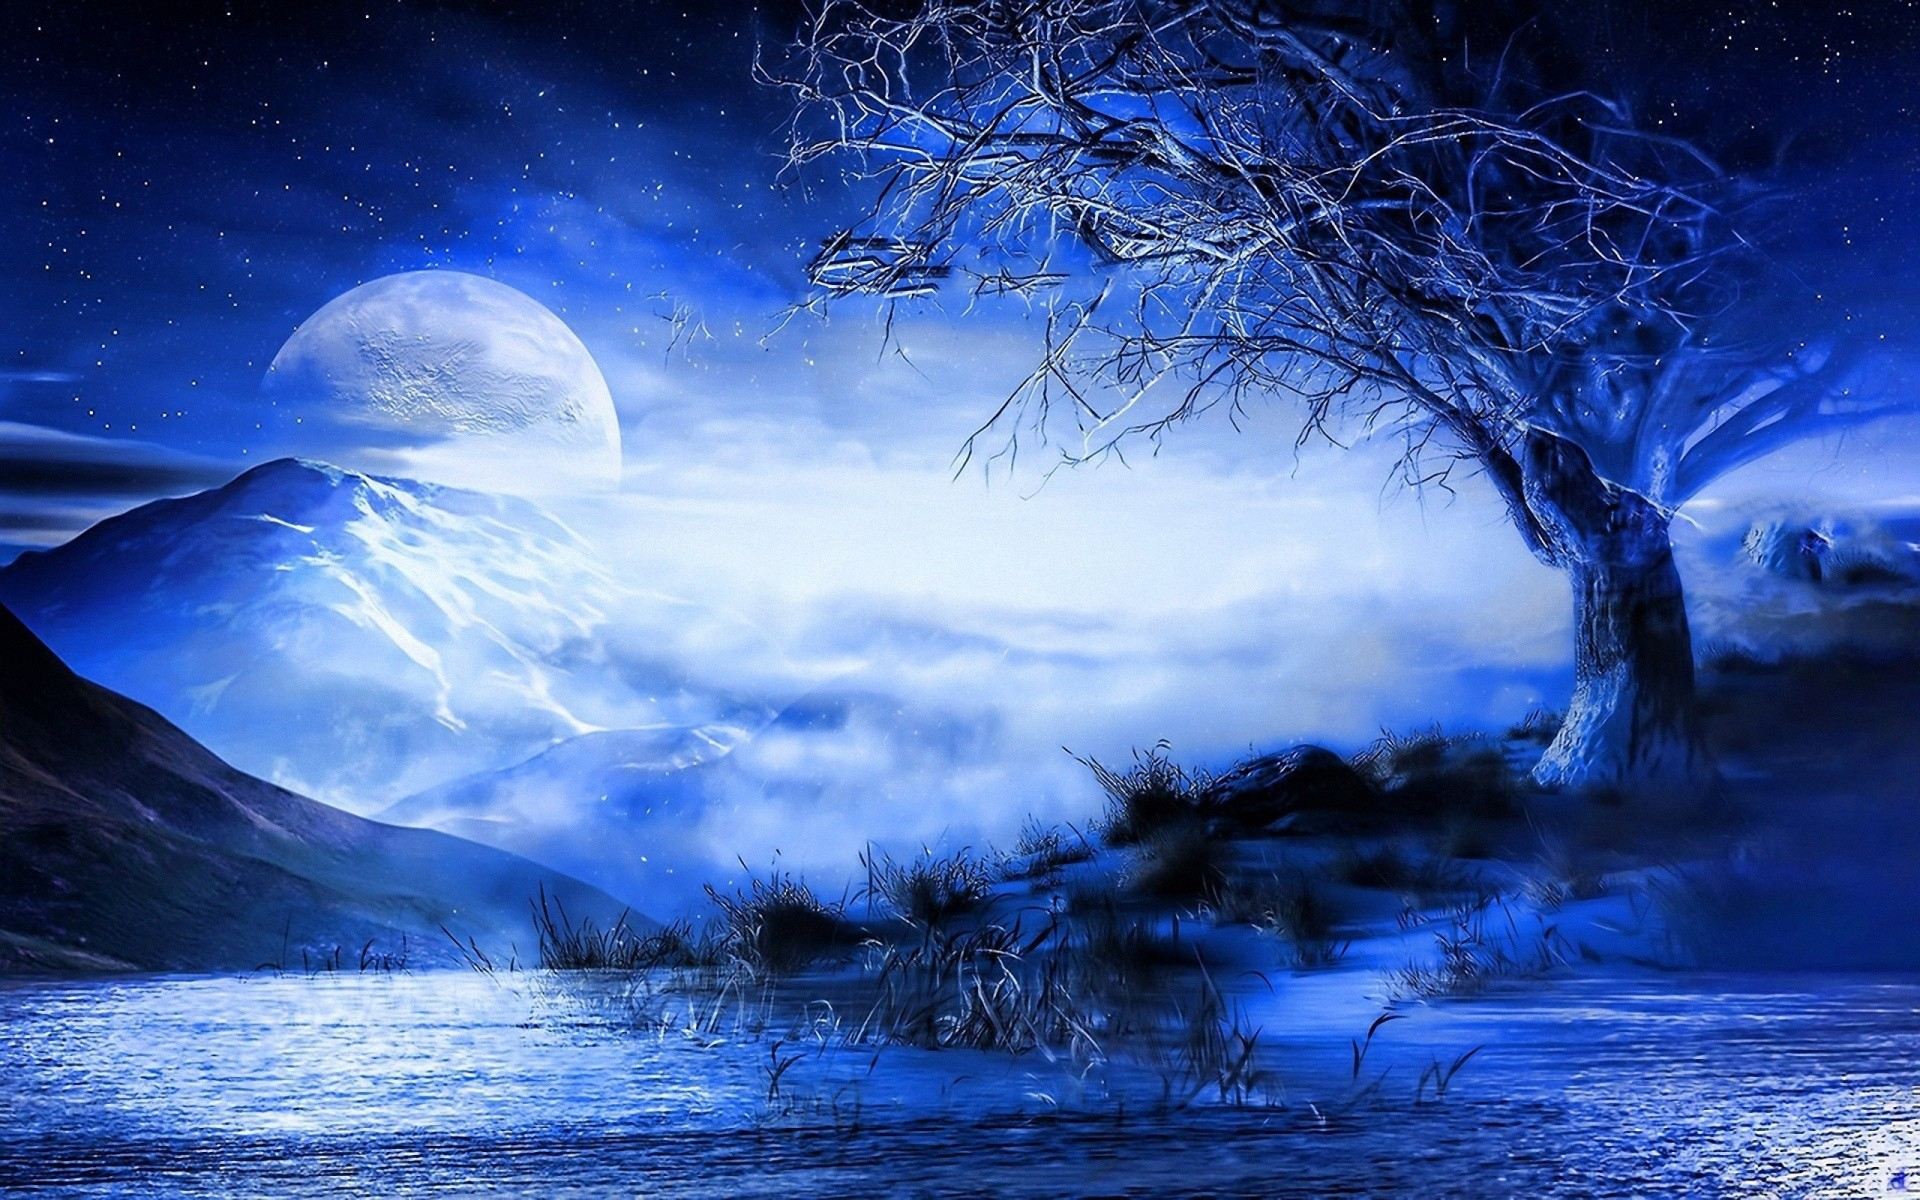 blue moon wallpaper (63+ images)